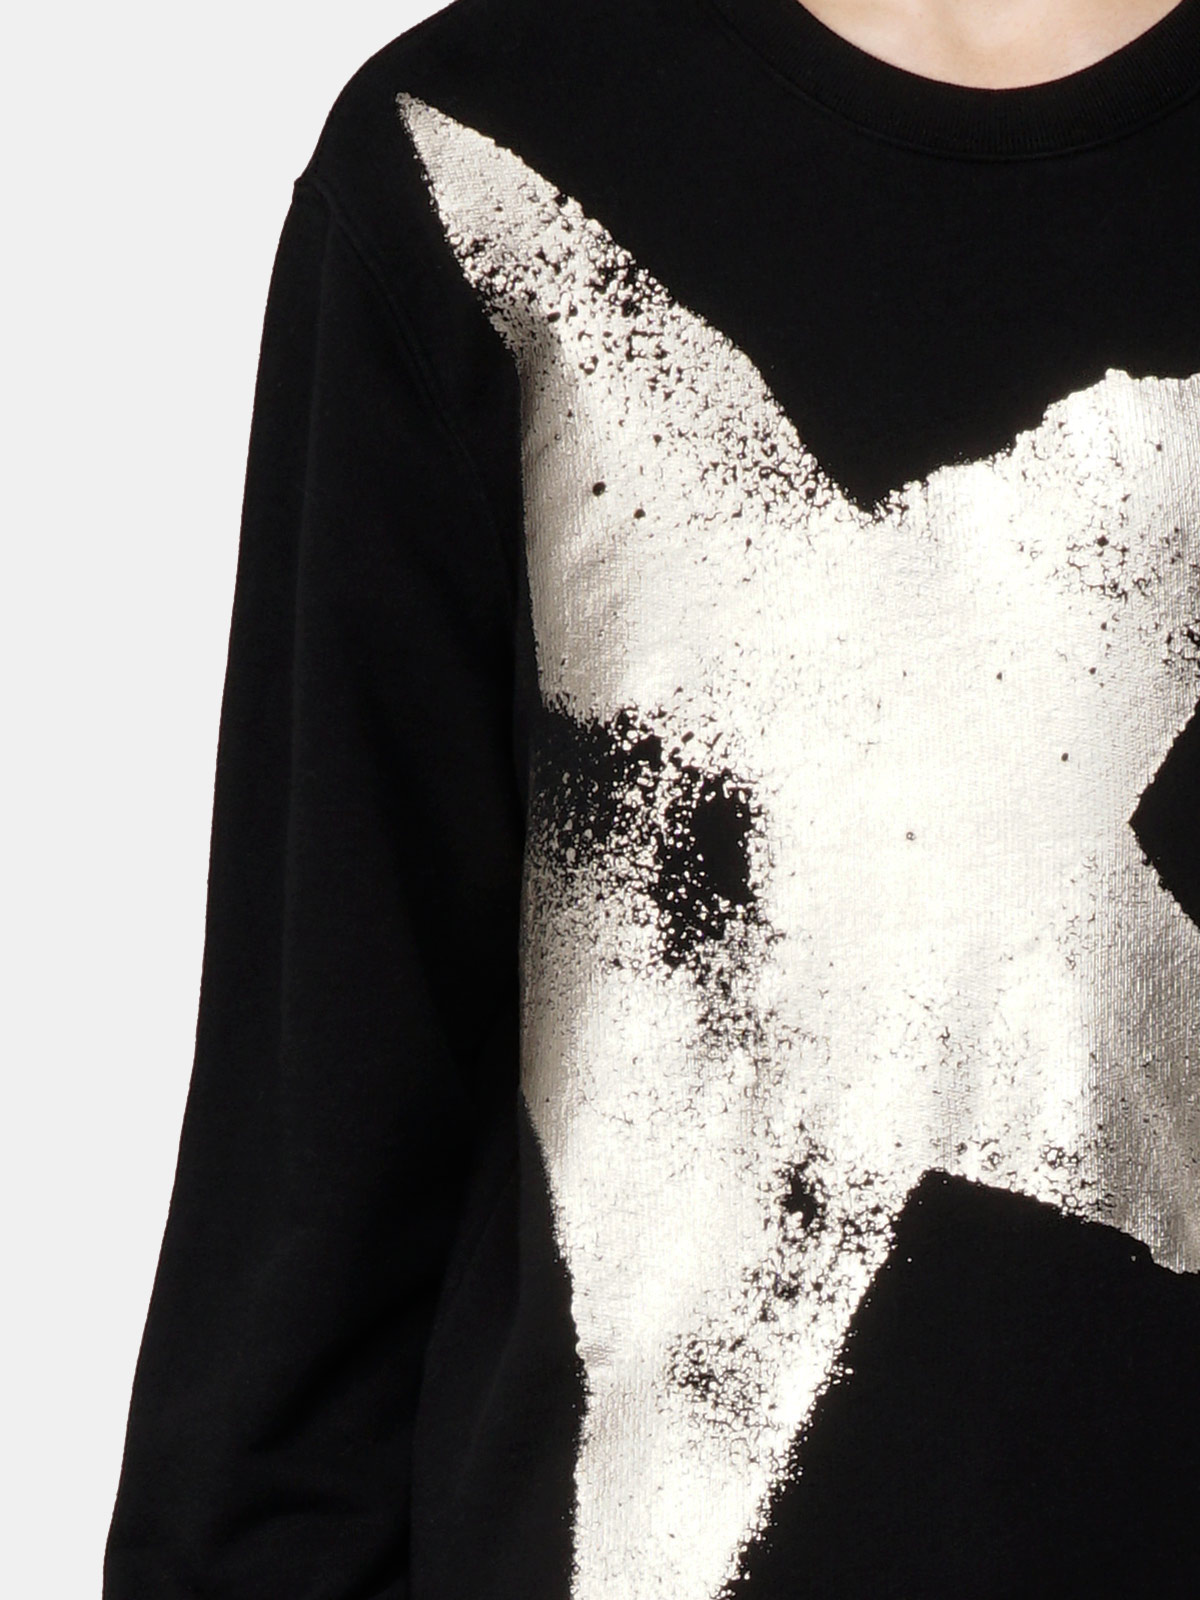 Golden Goose - Archibald sweatshirt with gold star print   in